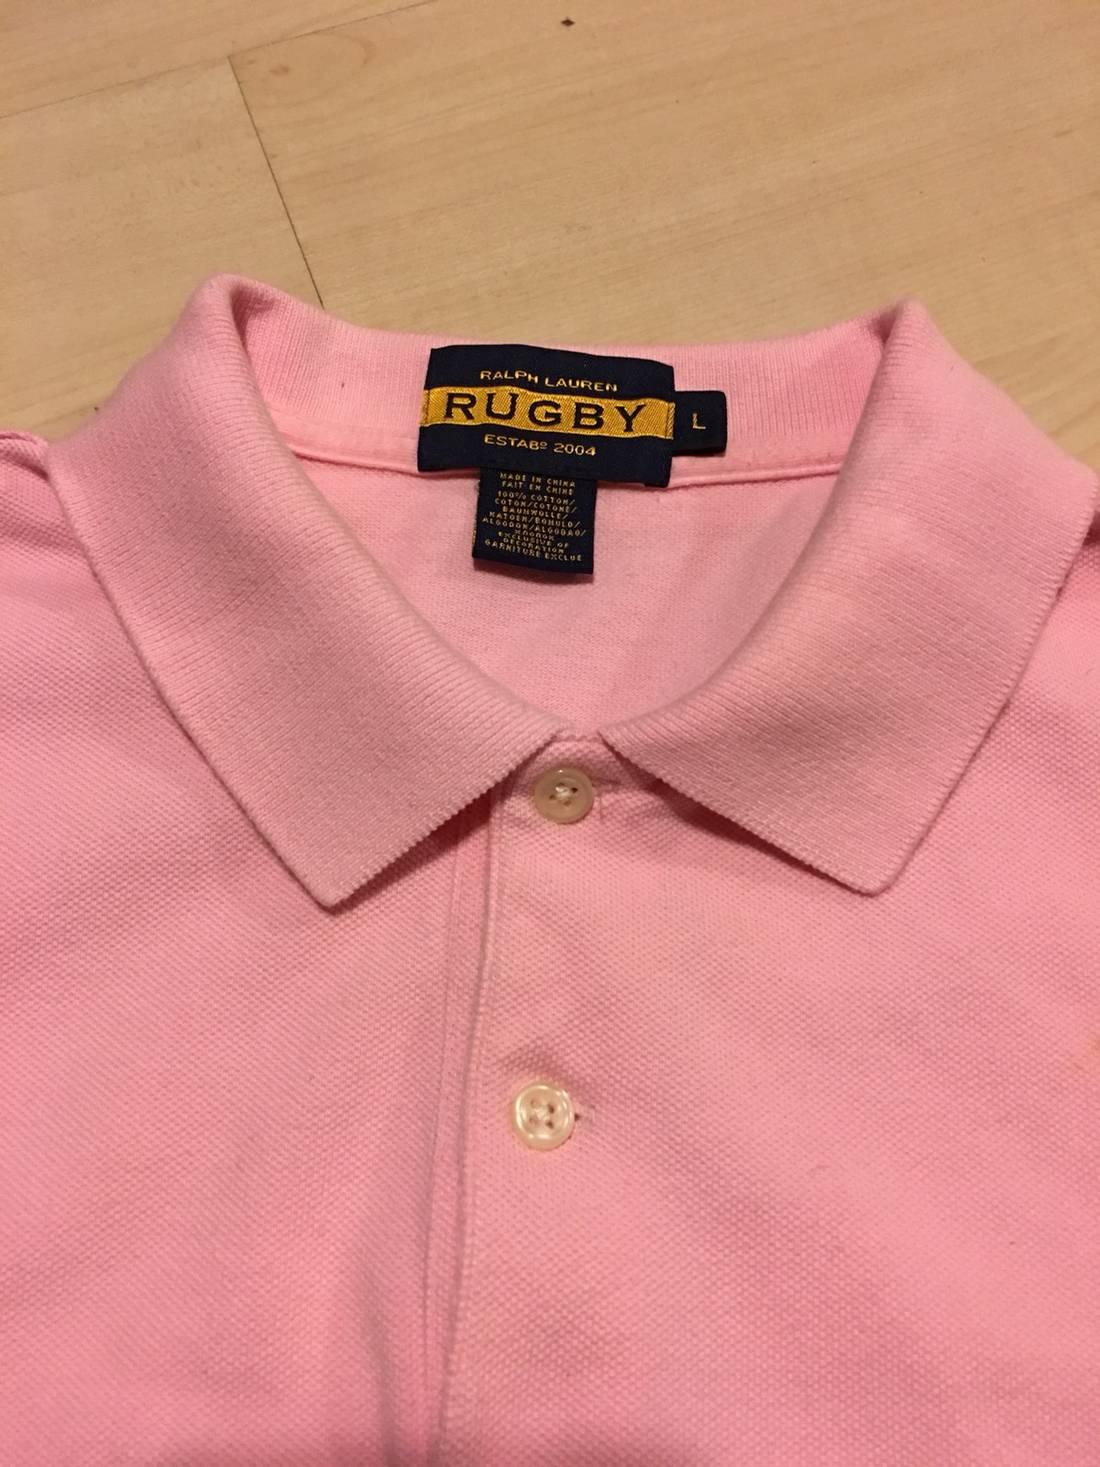 ... Lauren Polo Shirts From China Wholesale cheap Ralph Lauren racing polo T -shirts Italy Polo ralph lauren men chinese new year polo shirt snlxo6bnn  black ... c42910384c6